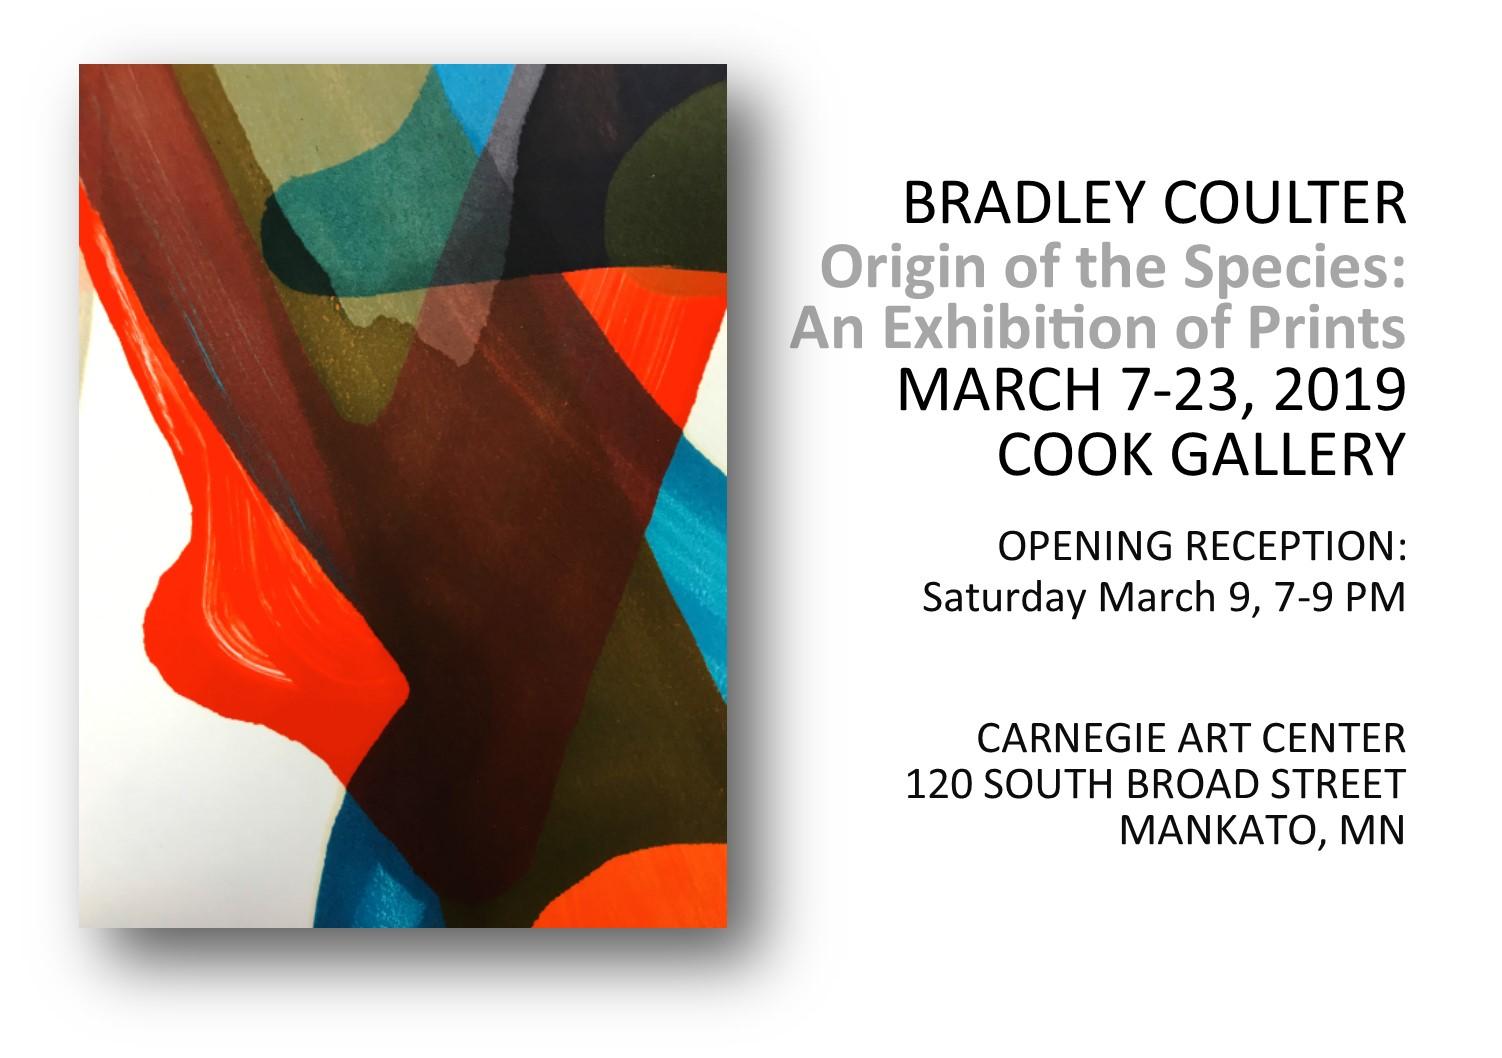 Exhibit - Bradley Coulter, Origin of the Species: An Exhibition of Prints